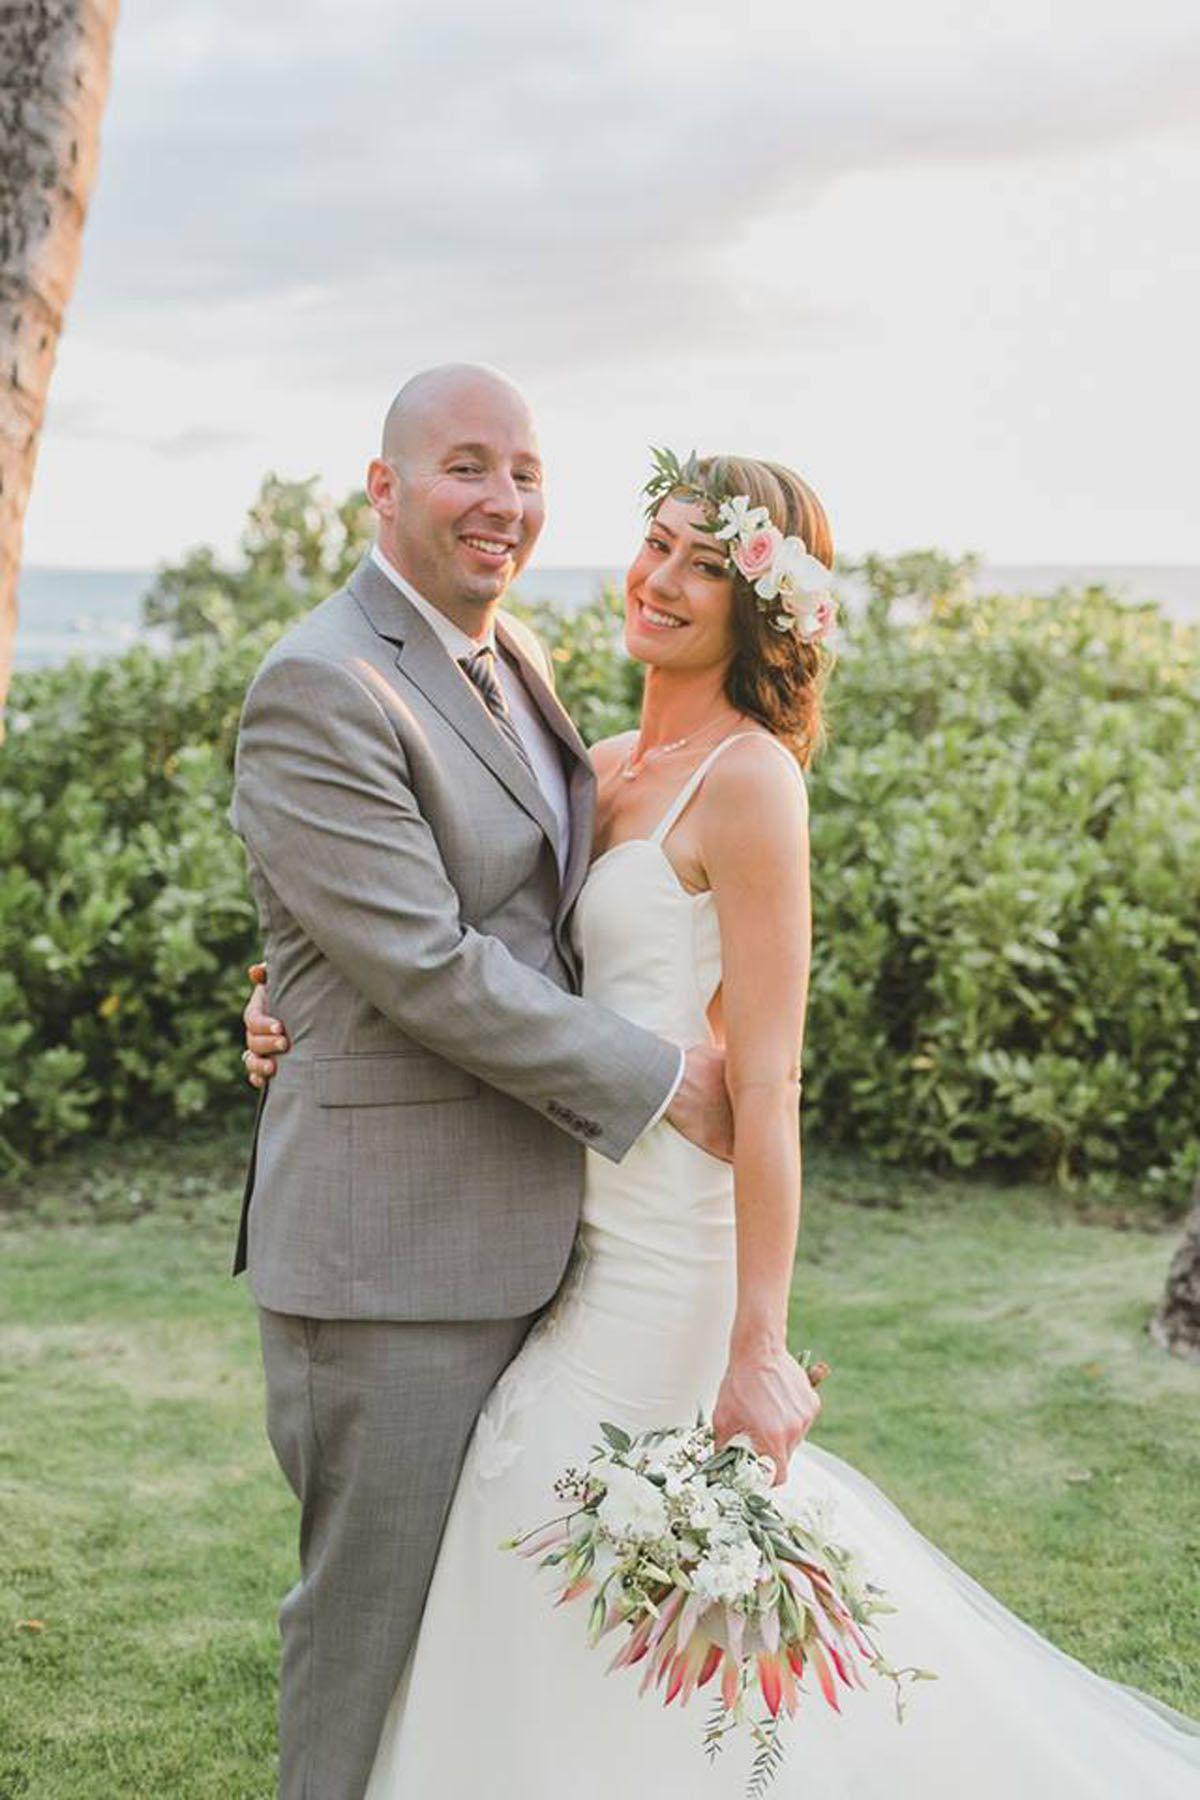 Blog Intimate Maui Beach Weddings Maui beach wedding